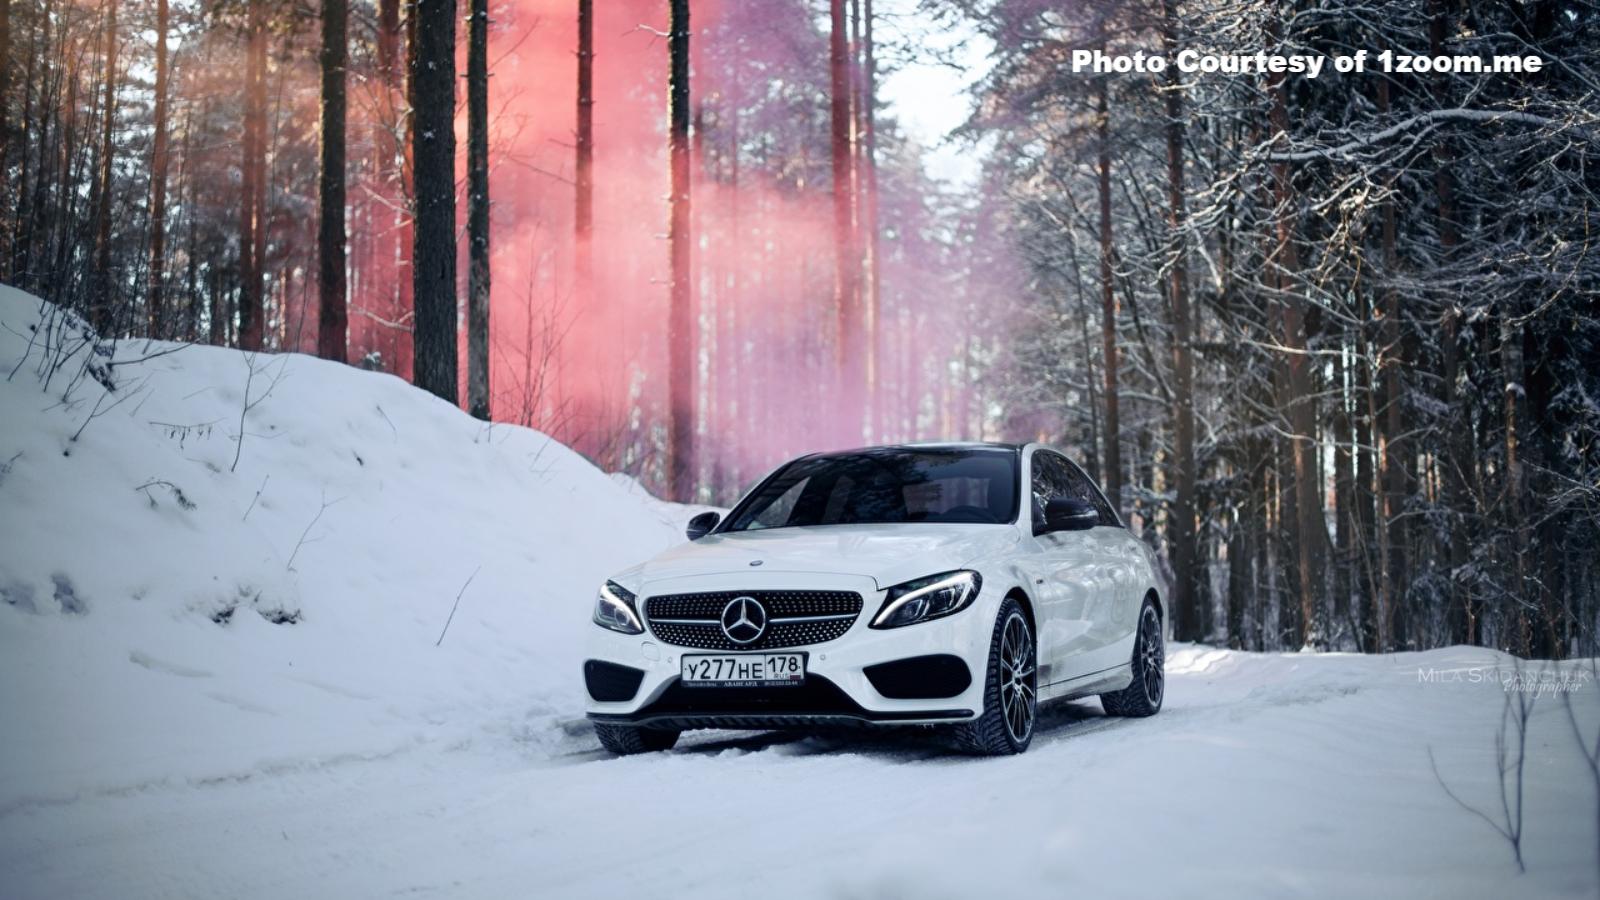 Mercedes Benz Winter Wallpapers Mbworld